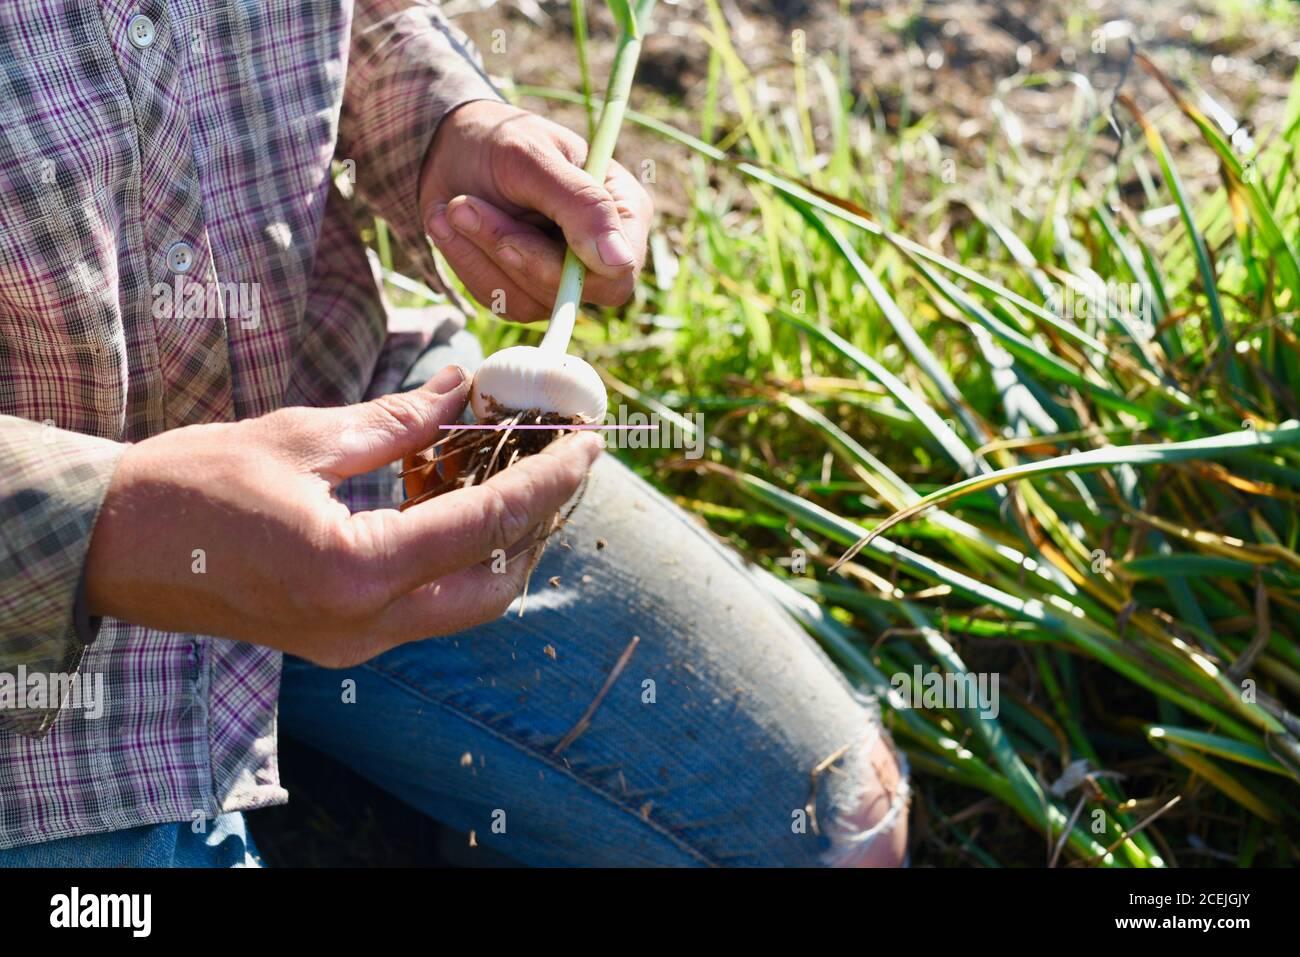 Woman farmer digging up and harvesting organic garlic bulbs, brushing off soil, in growing field at a small farm in Decorah, Iowa, USA Stock Photo